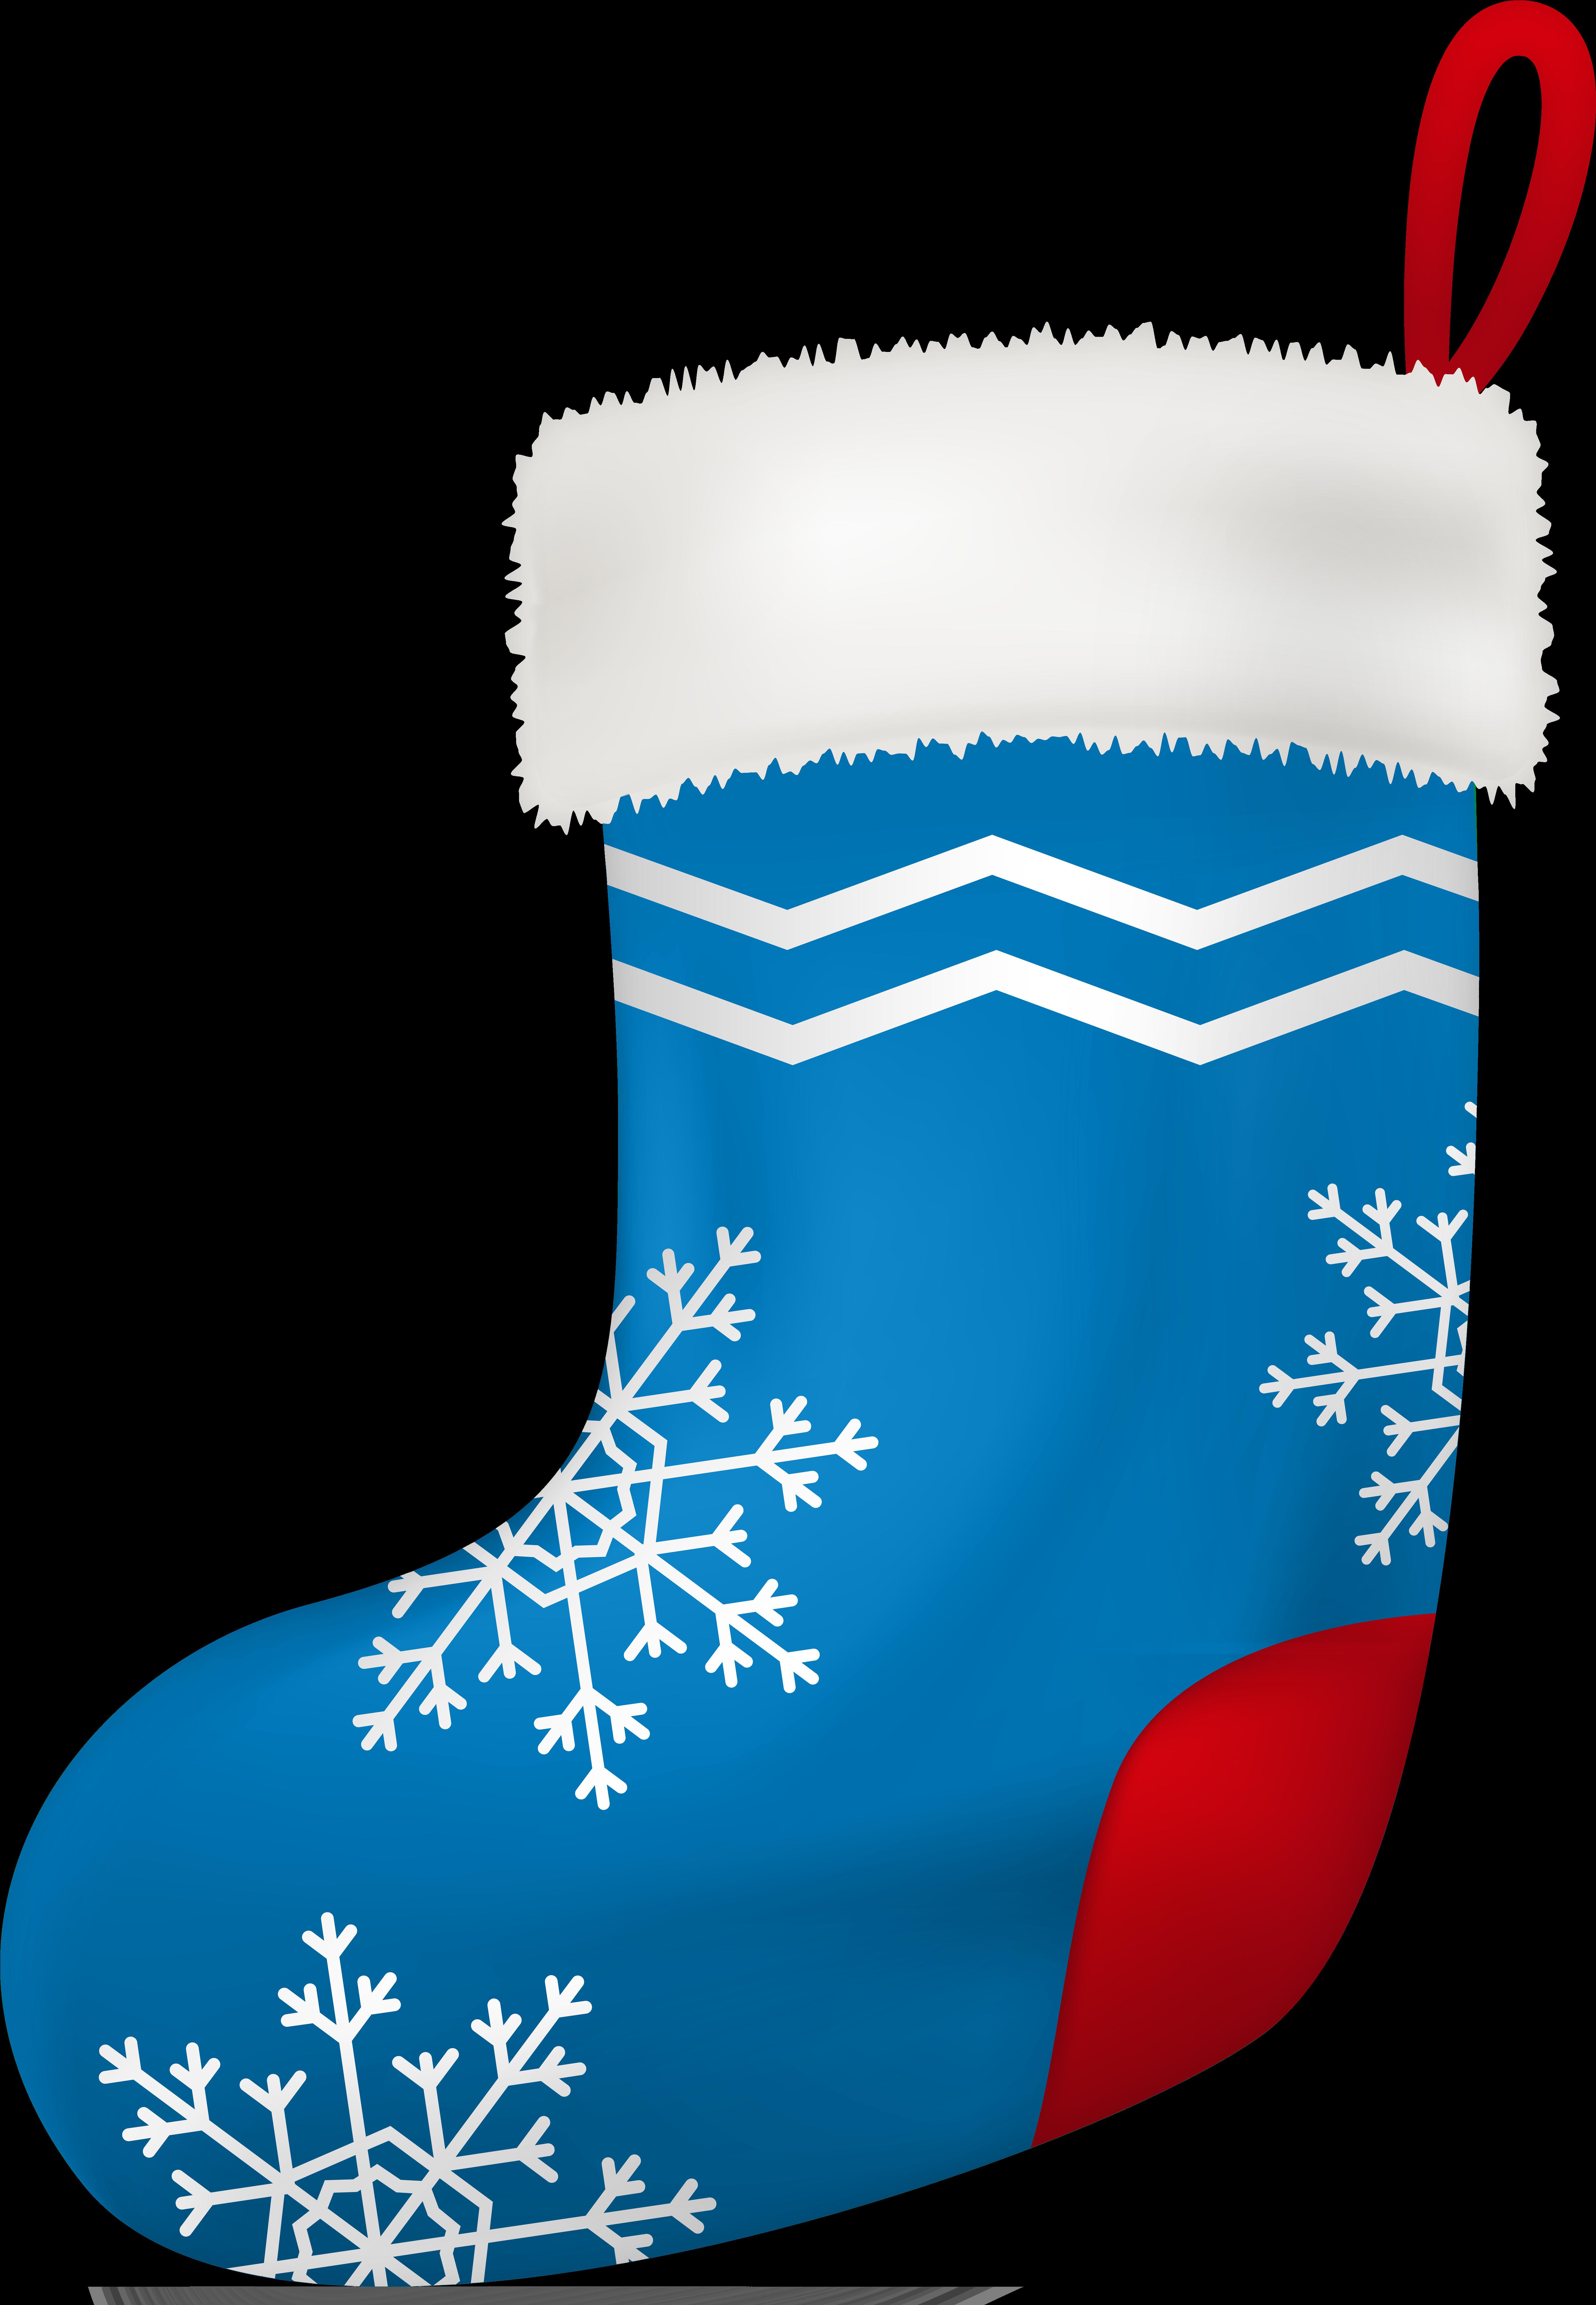 Transparent christmas stocking clipart black and white - Stocking Clipart Boot - Blue Christmas Stocking Clipart